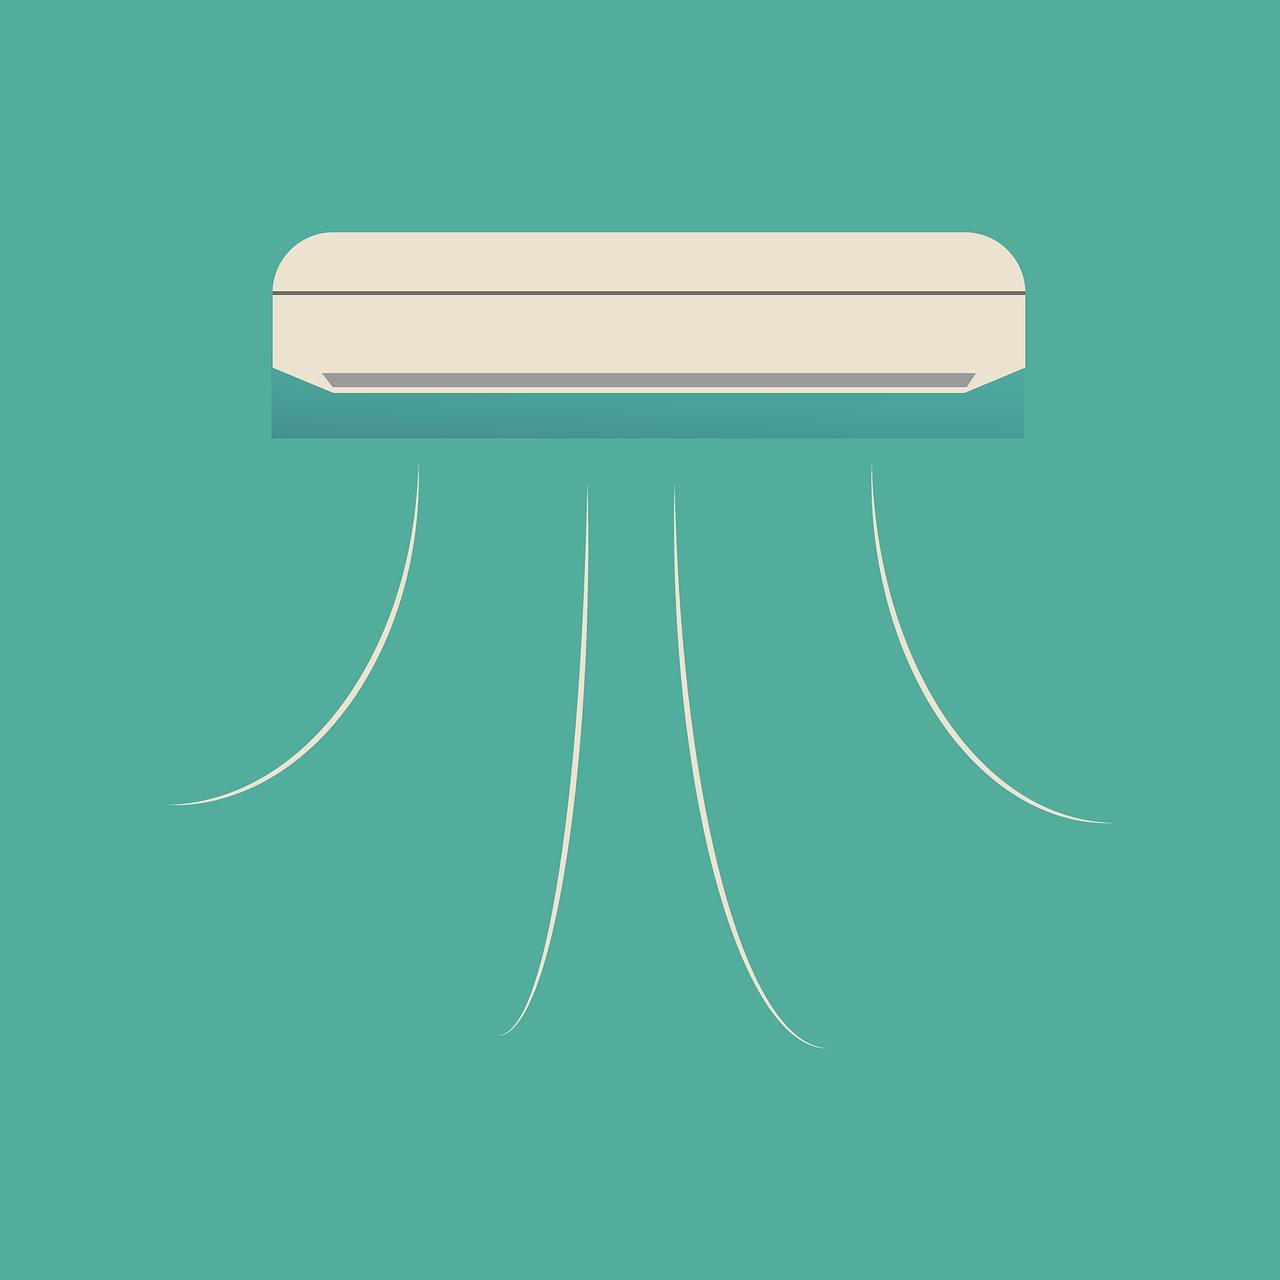 Air Conditioner 1573401529 - מזגן אינוורטר – למה הוא מומלץ ומה יתרונותיו?